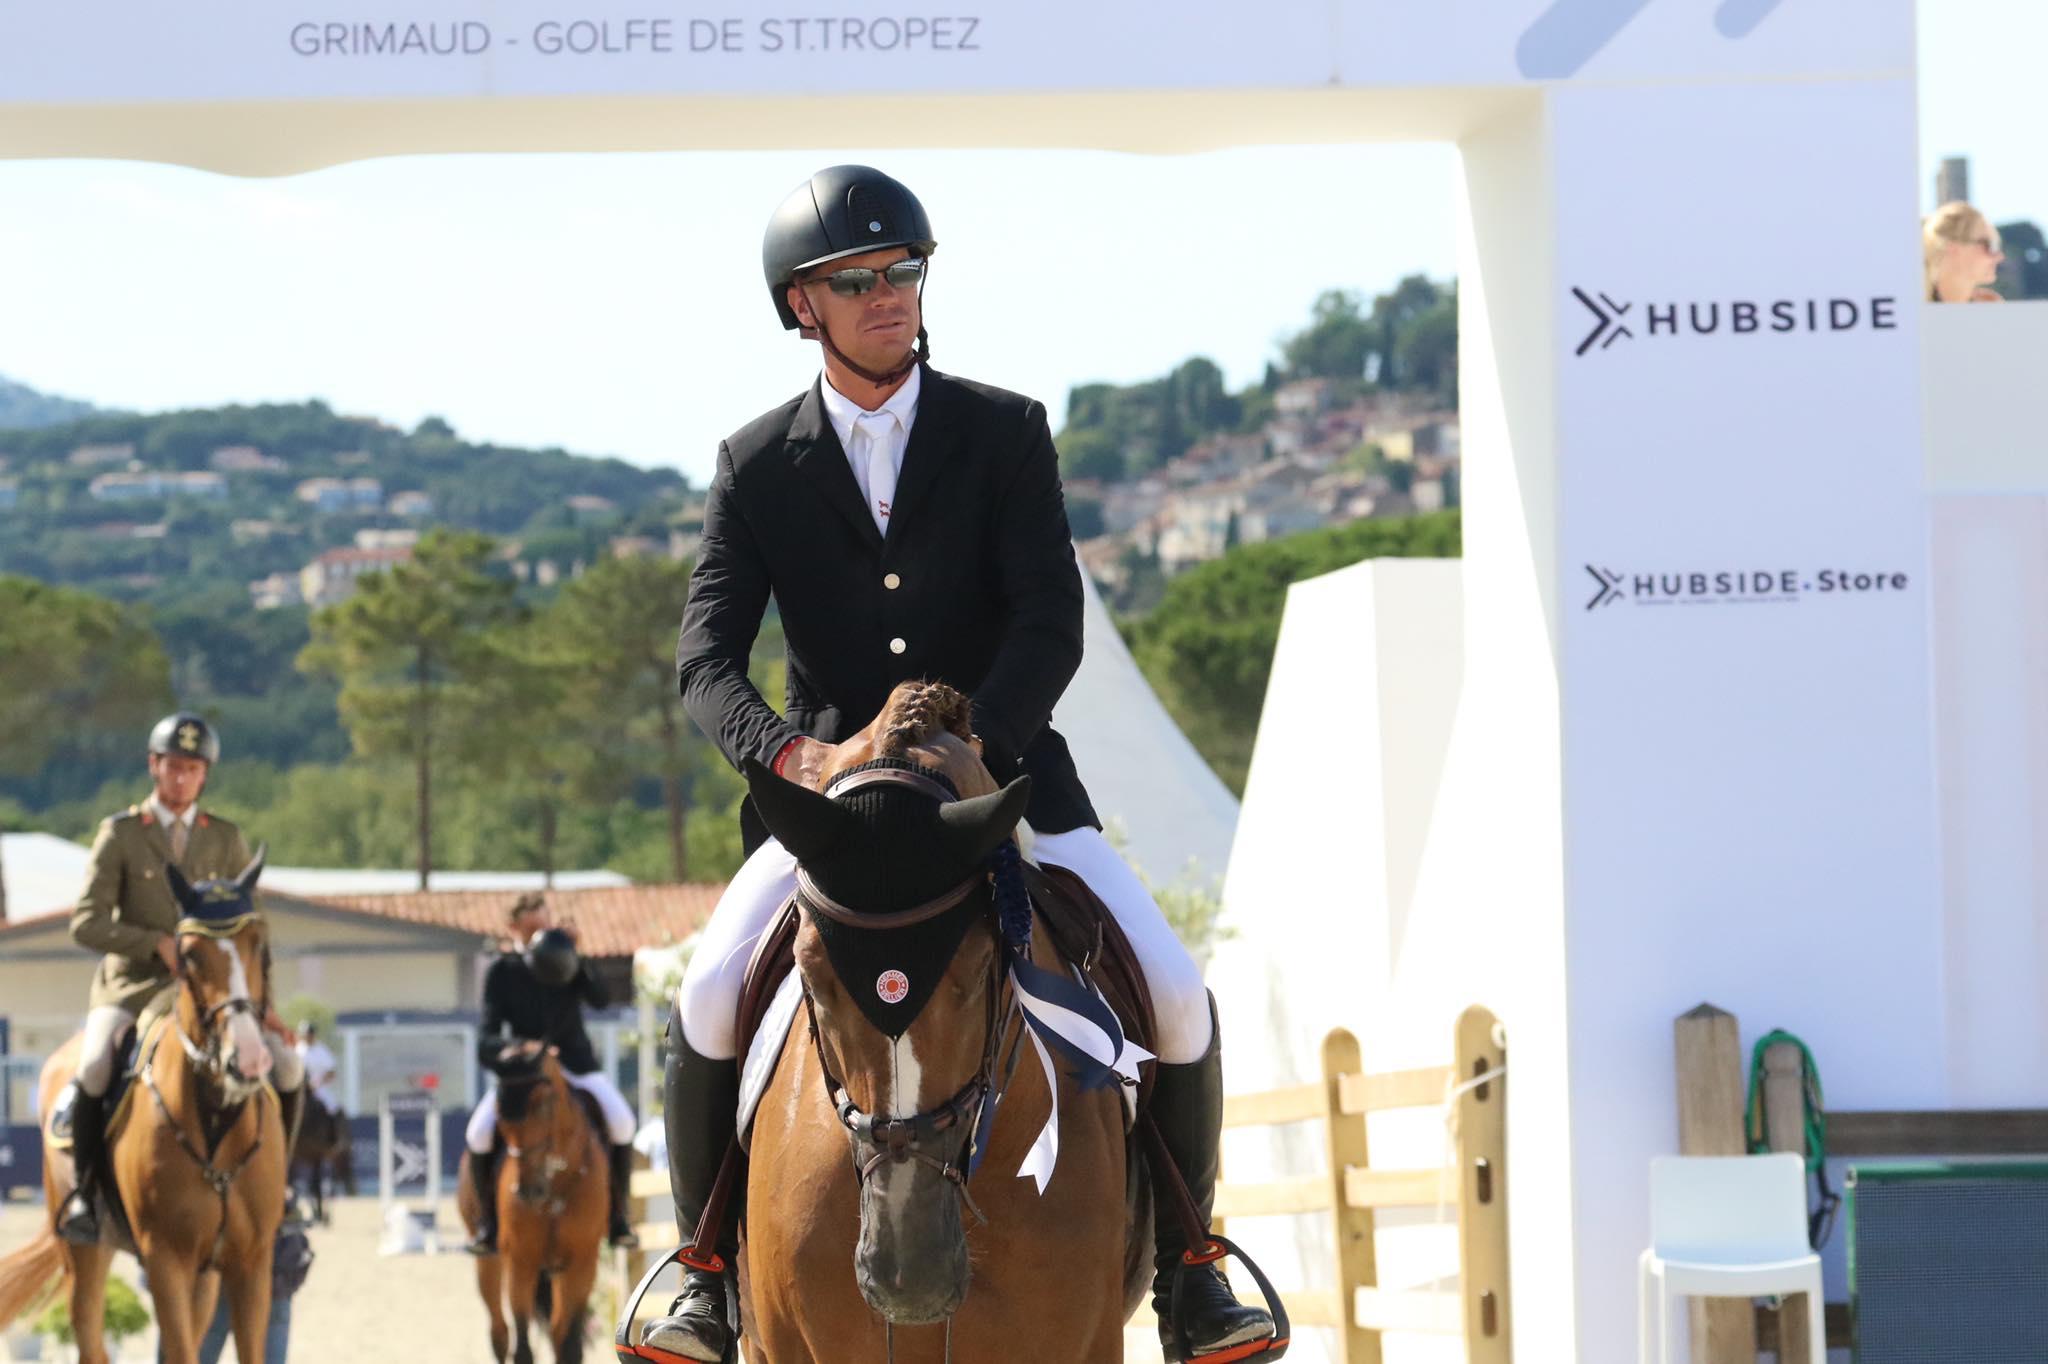 Guery zet zegereeks op Franse bodem voort